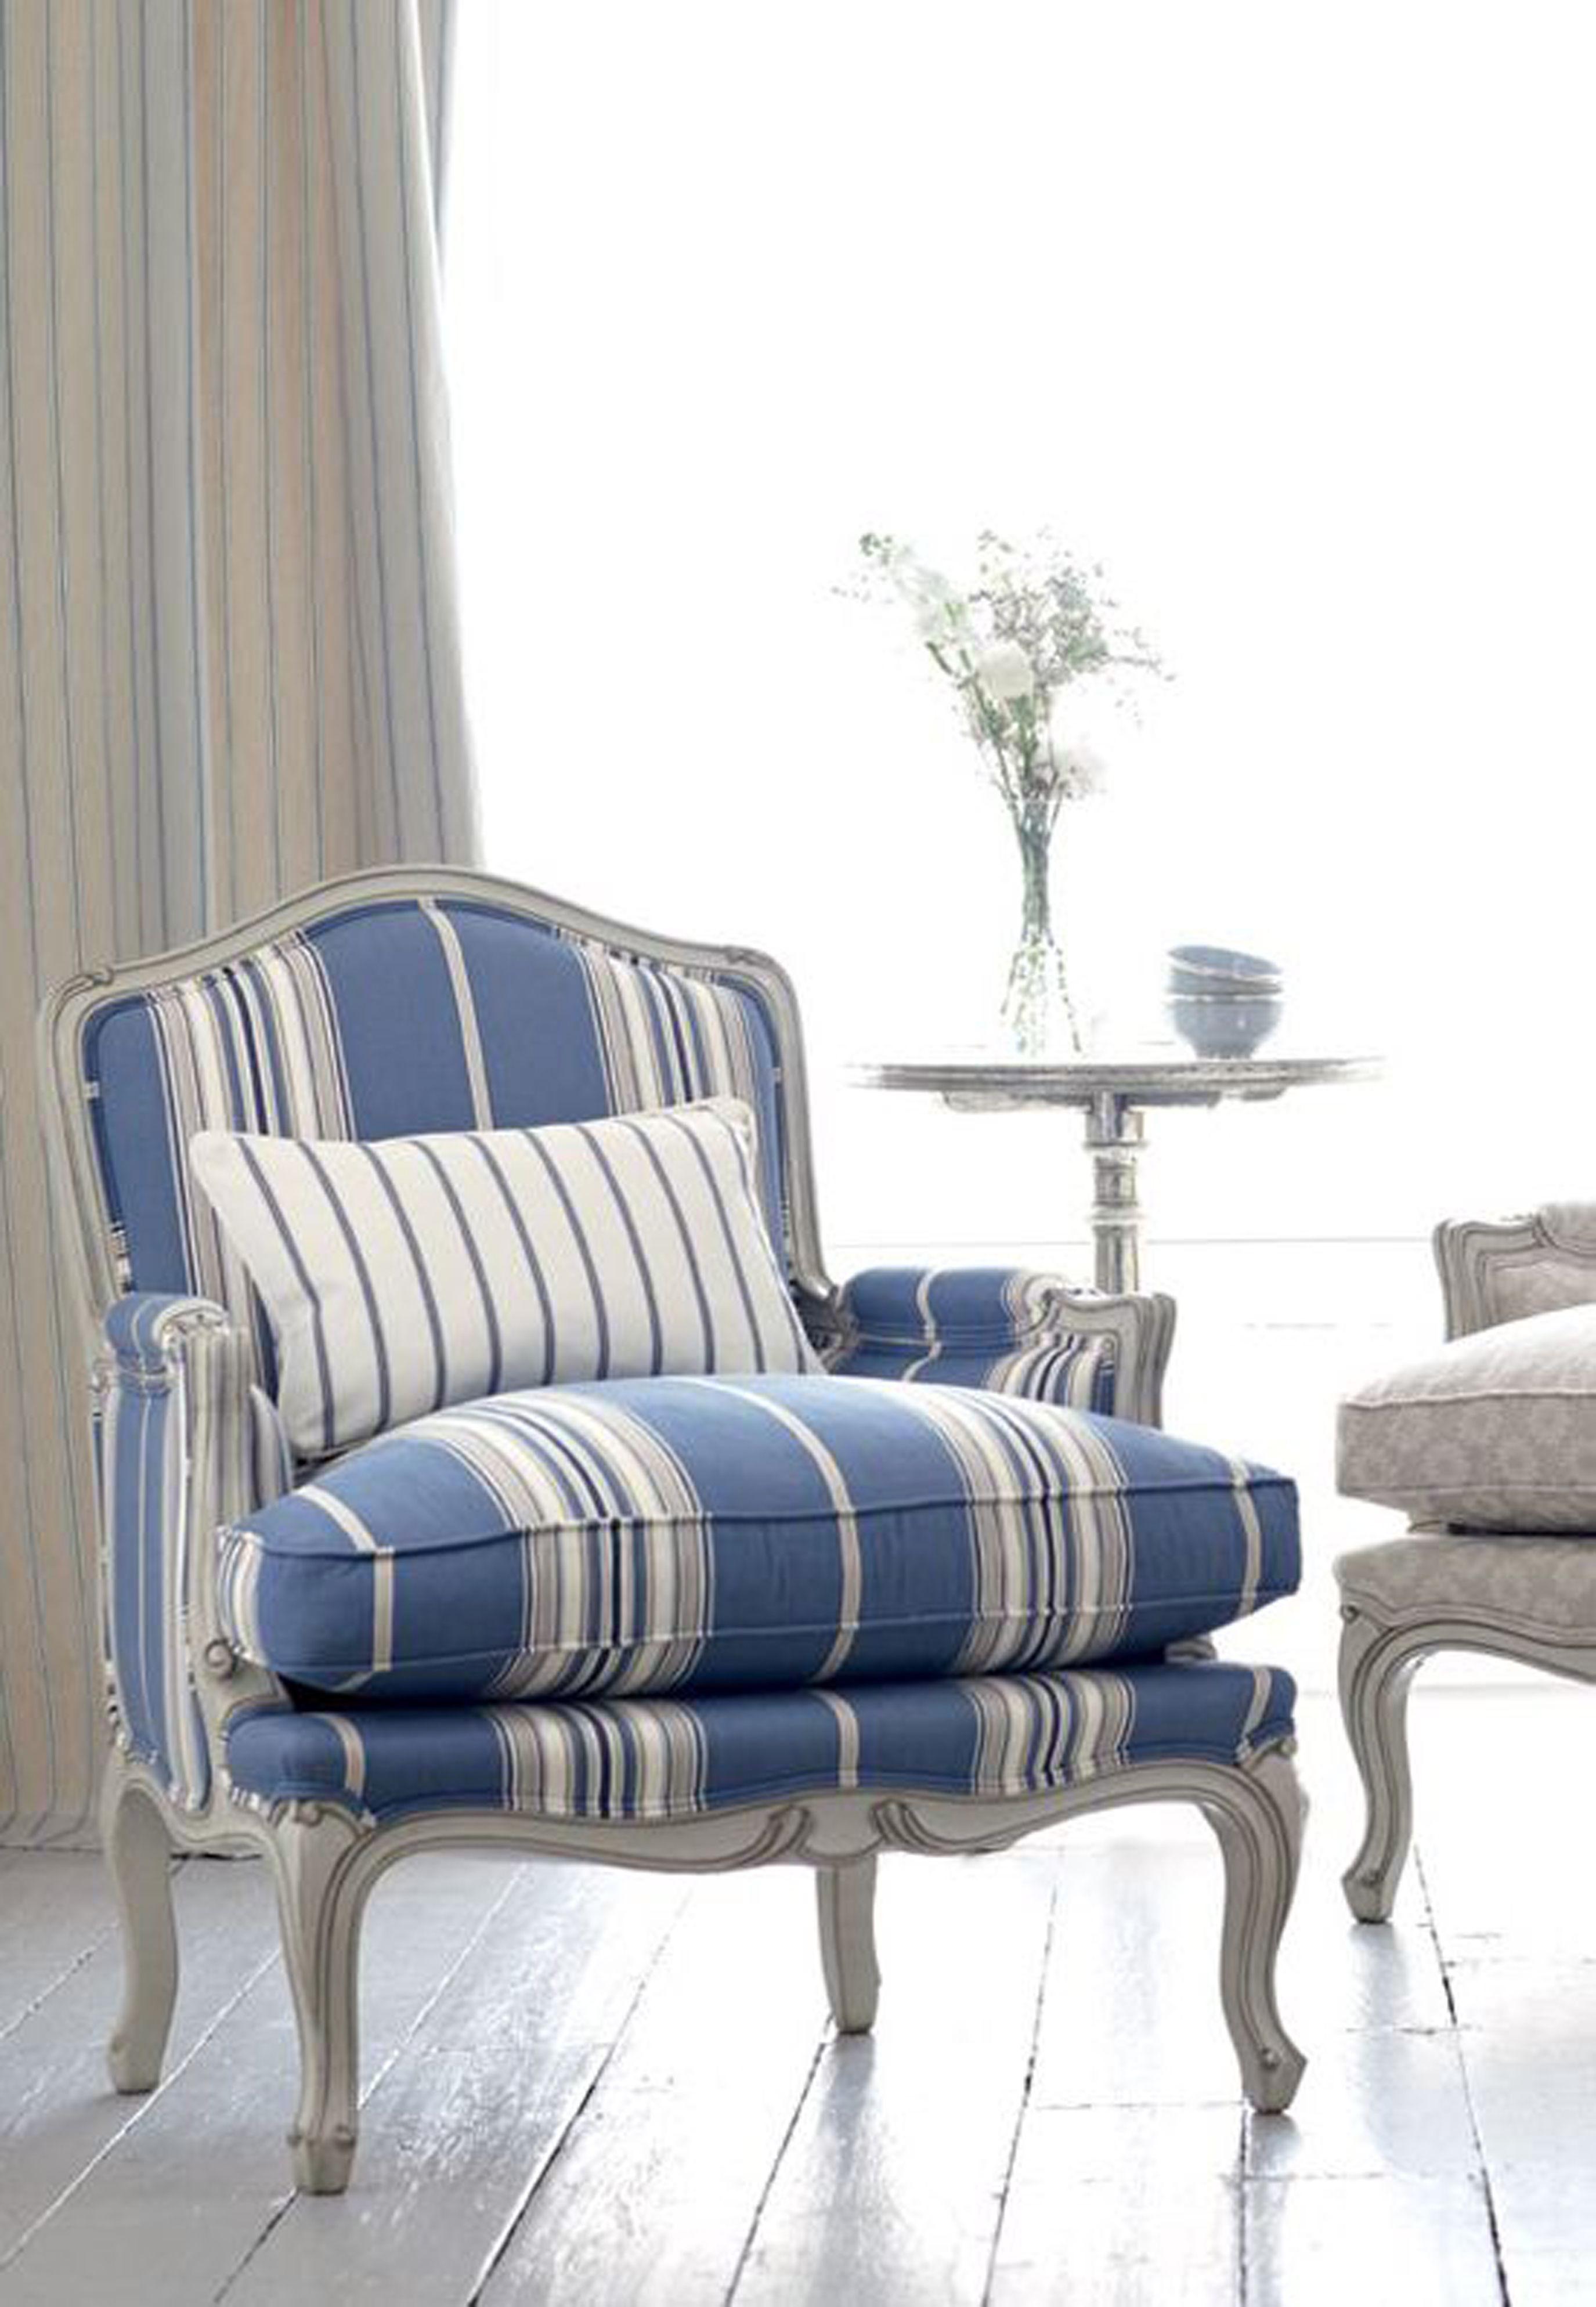 Chair blue stripes | 地中海 | Pinterest | Decorating, Provence style ...